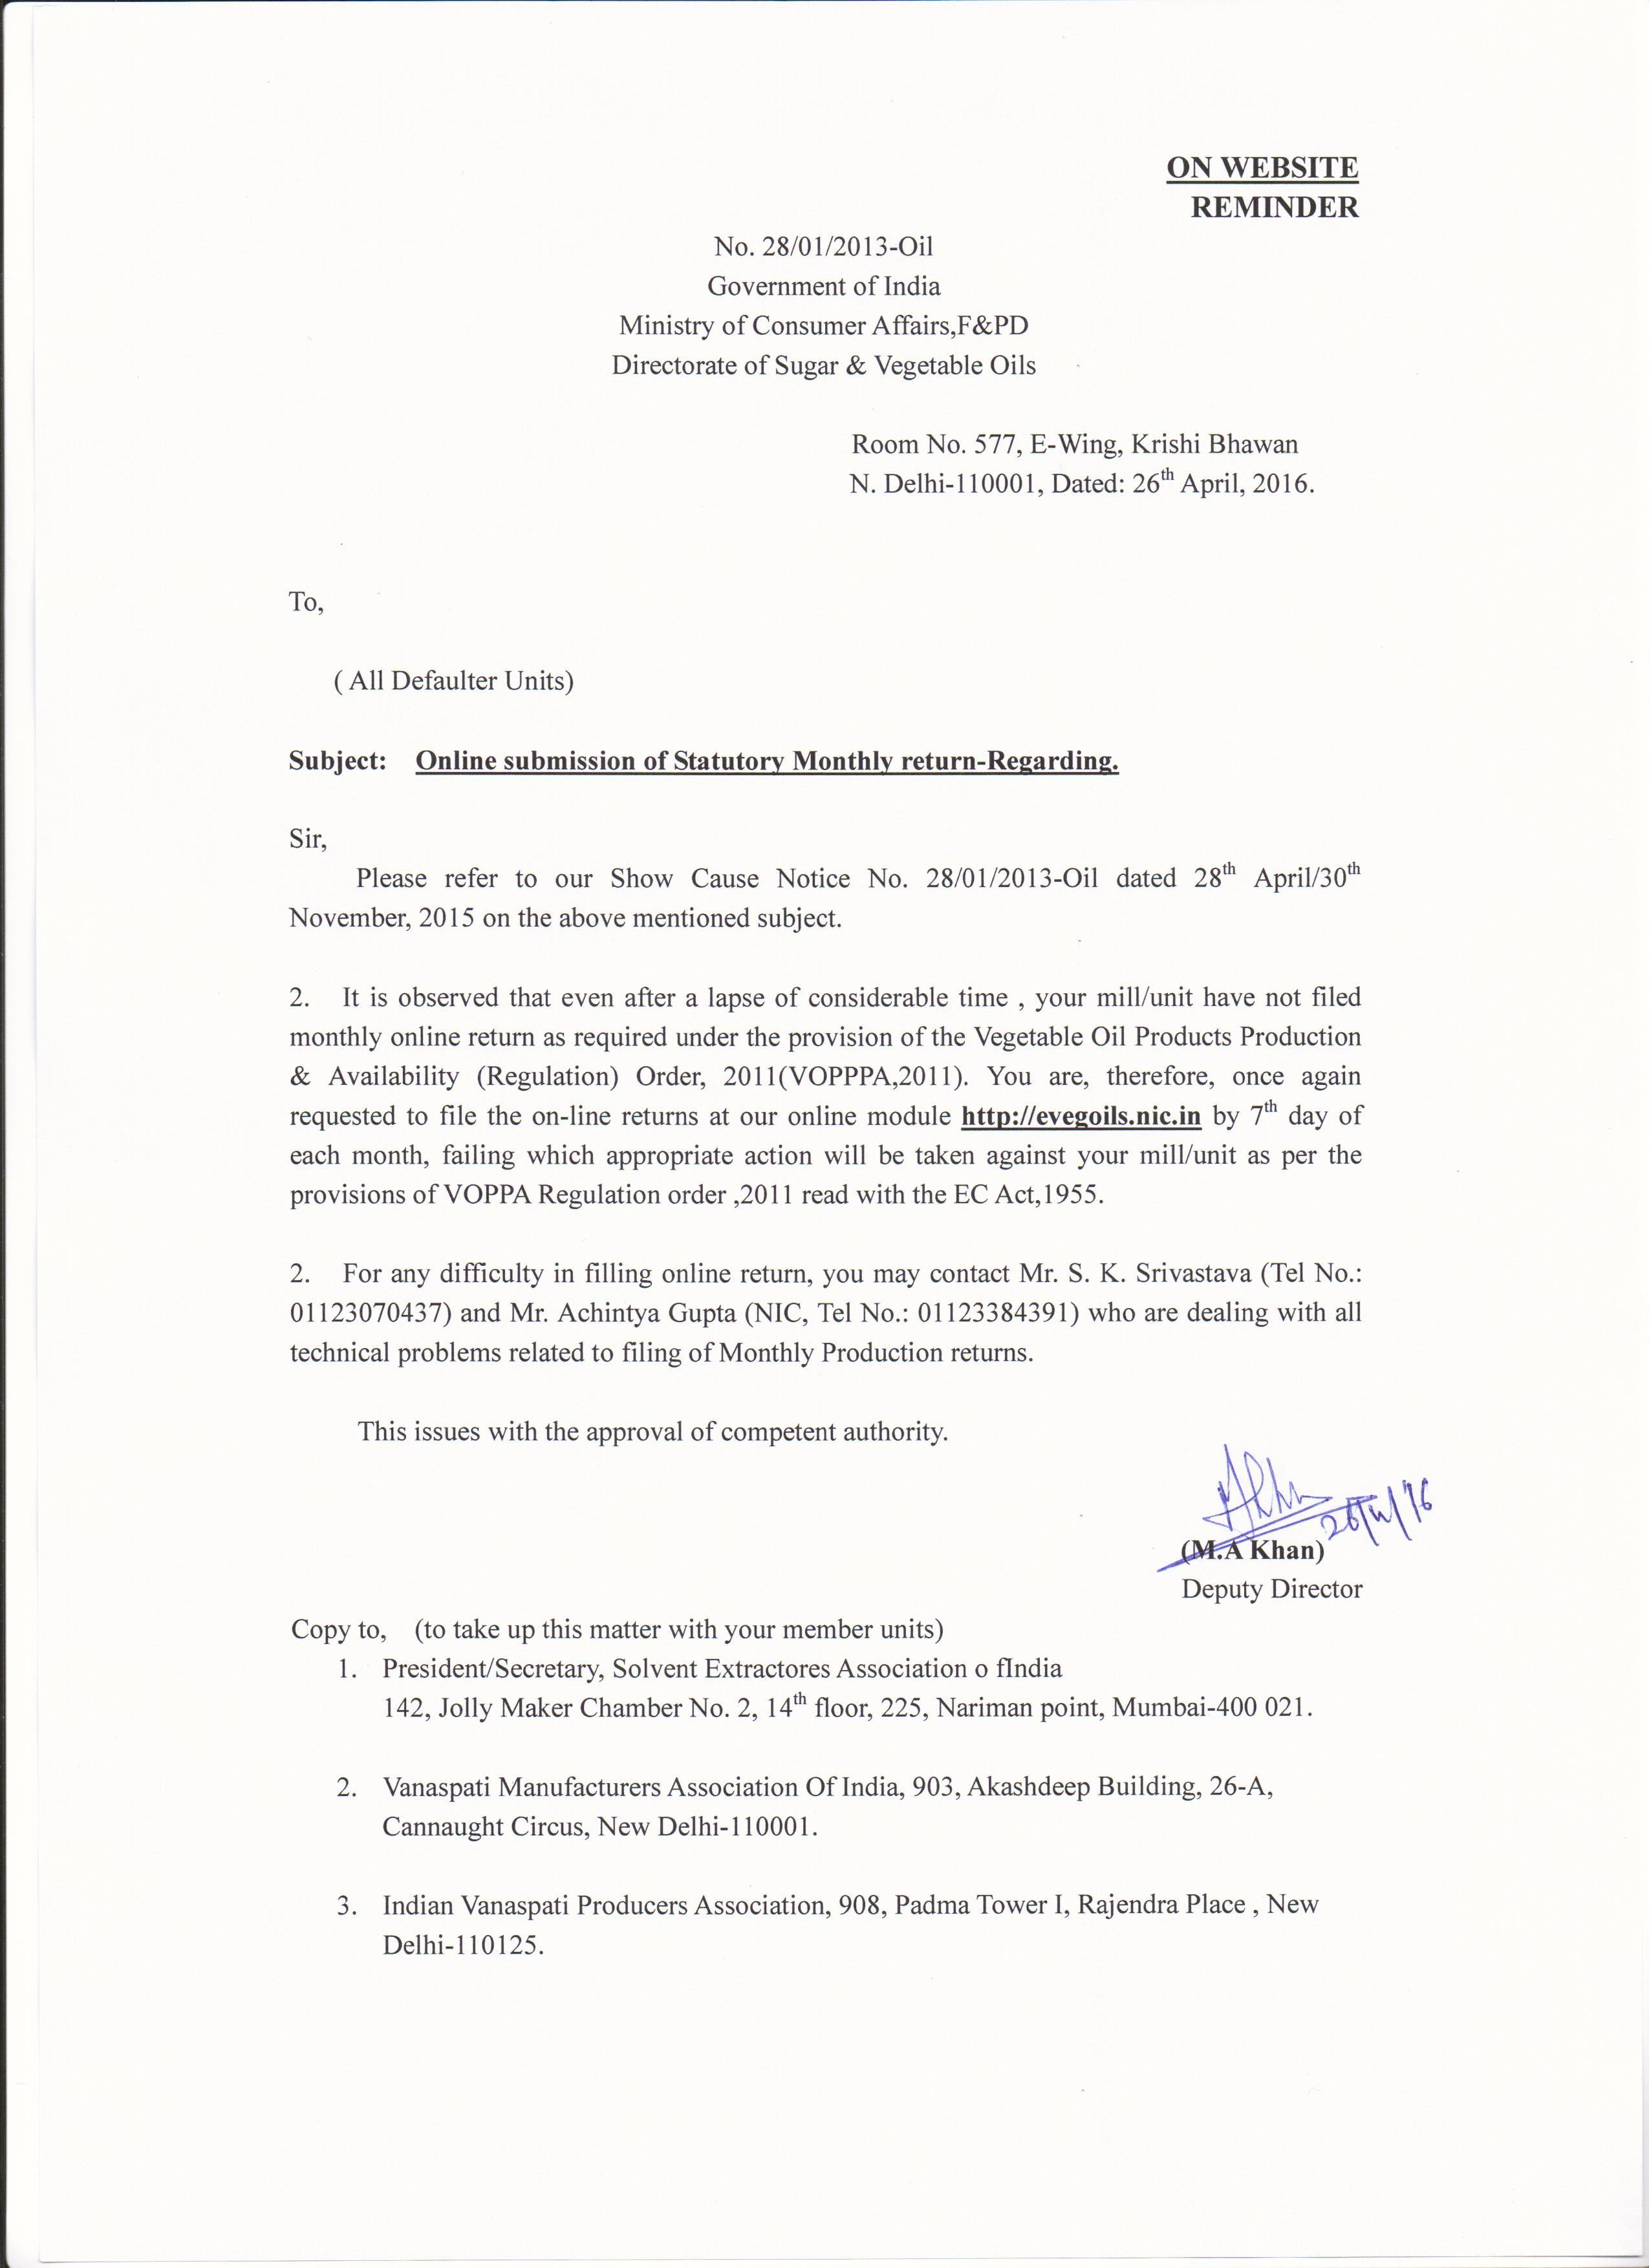 kpmg india annual report 2016 pdf